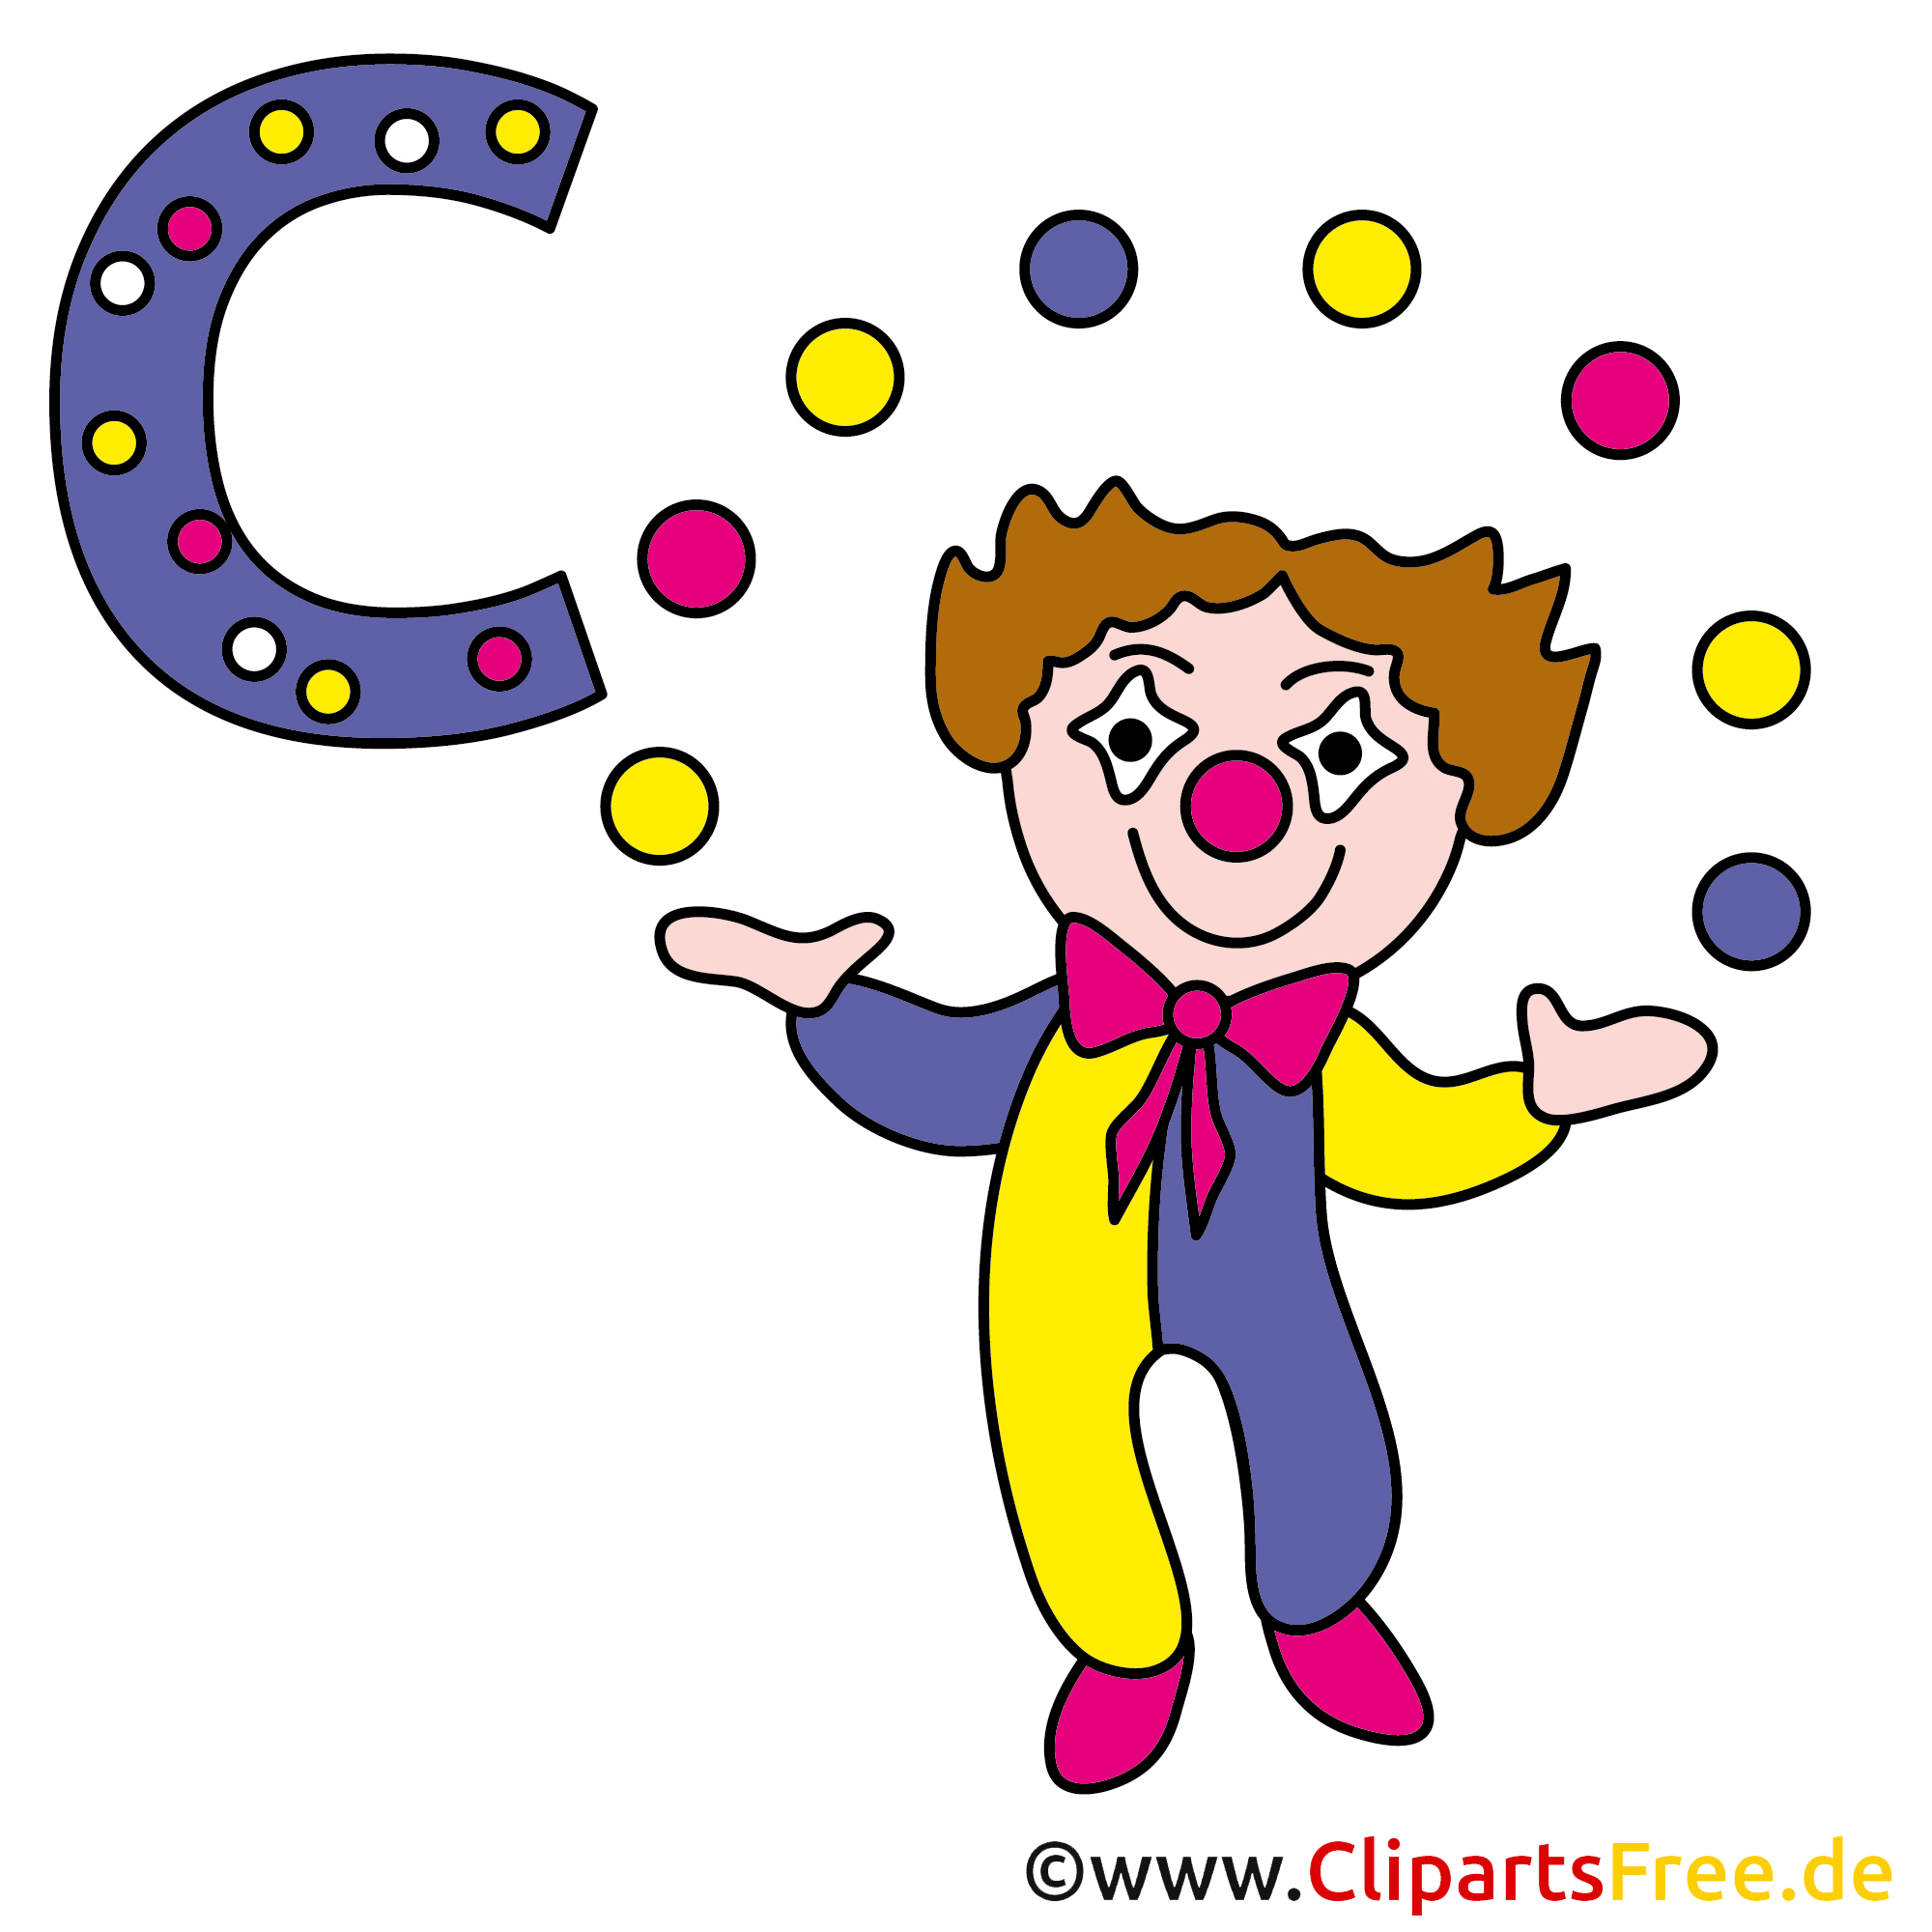 Abc lernen - Clown Bild